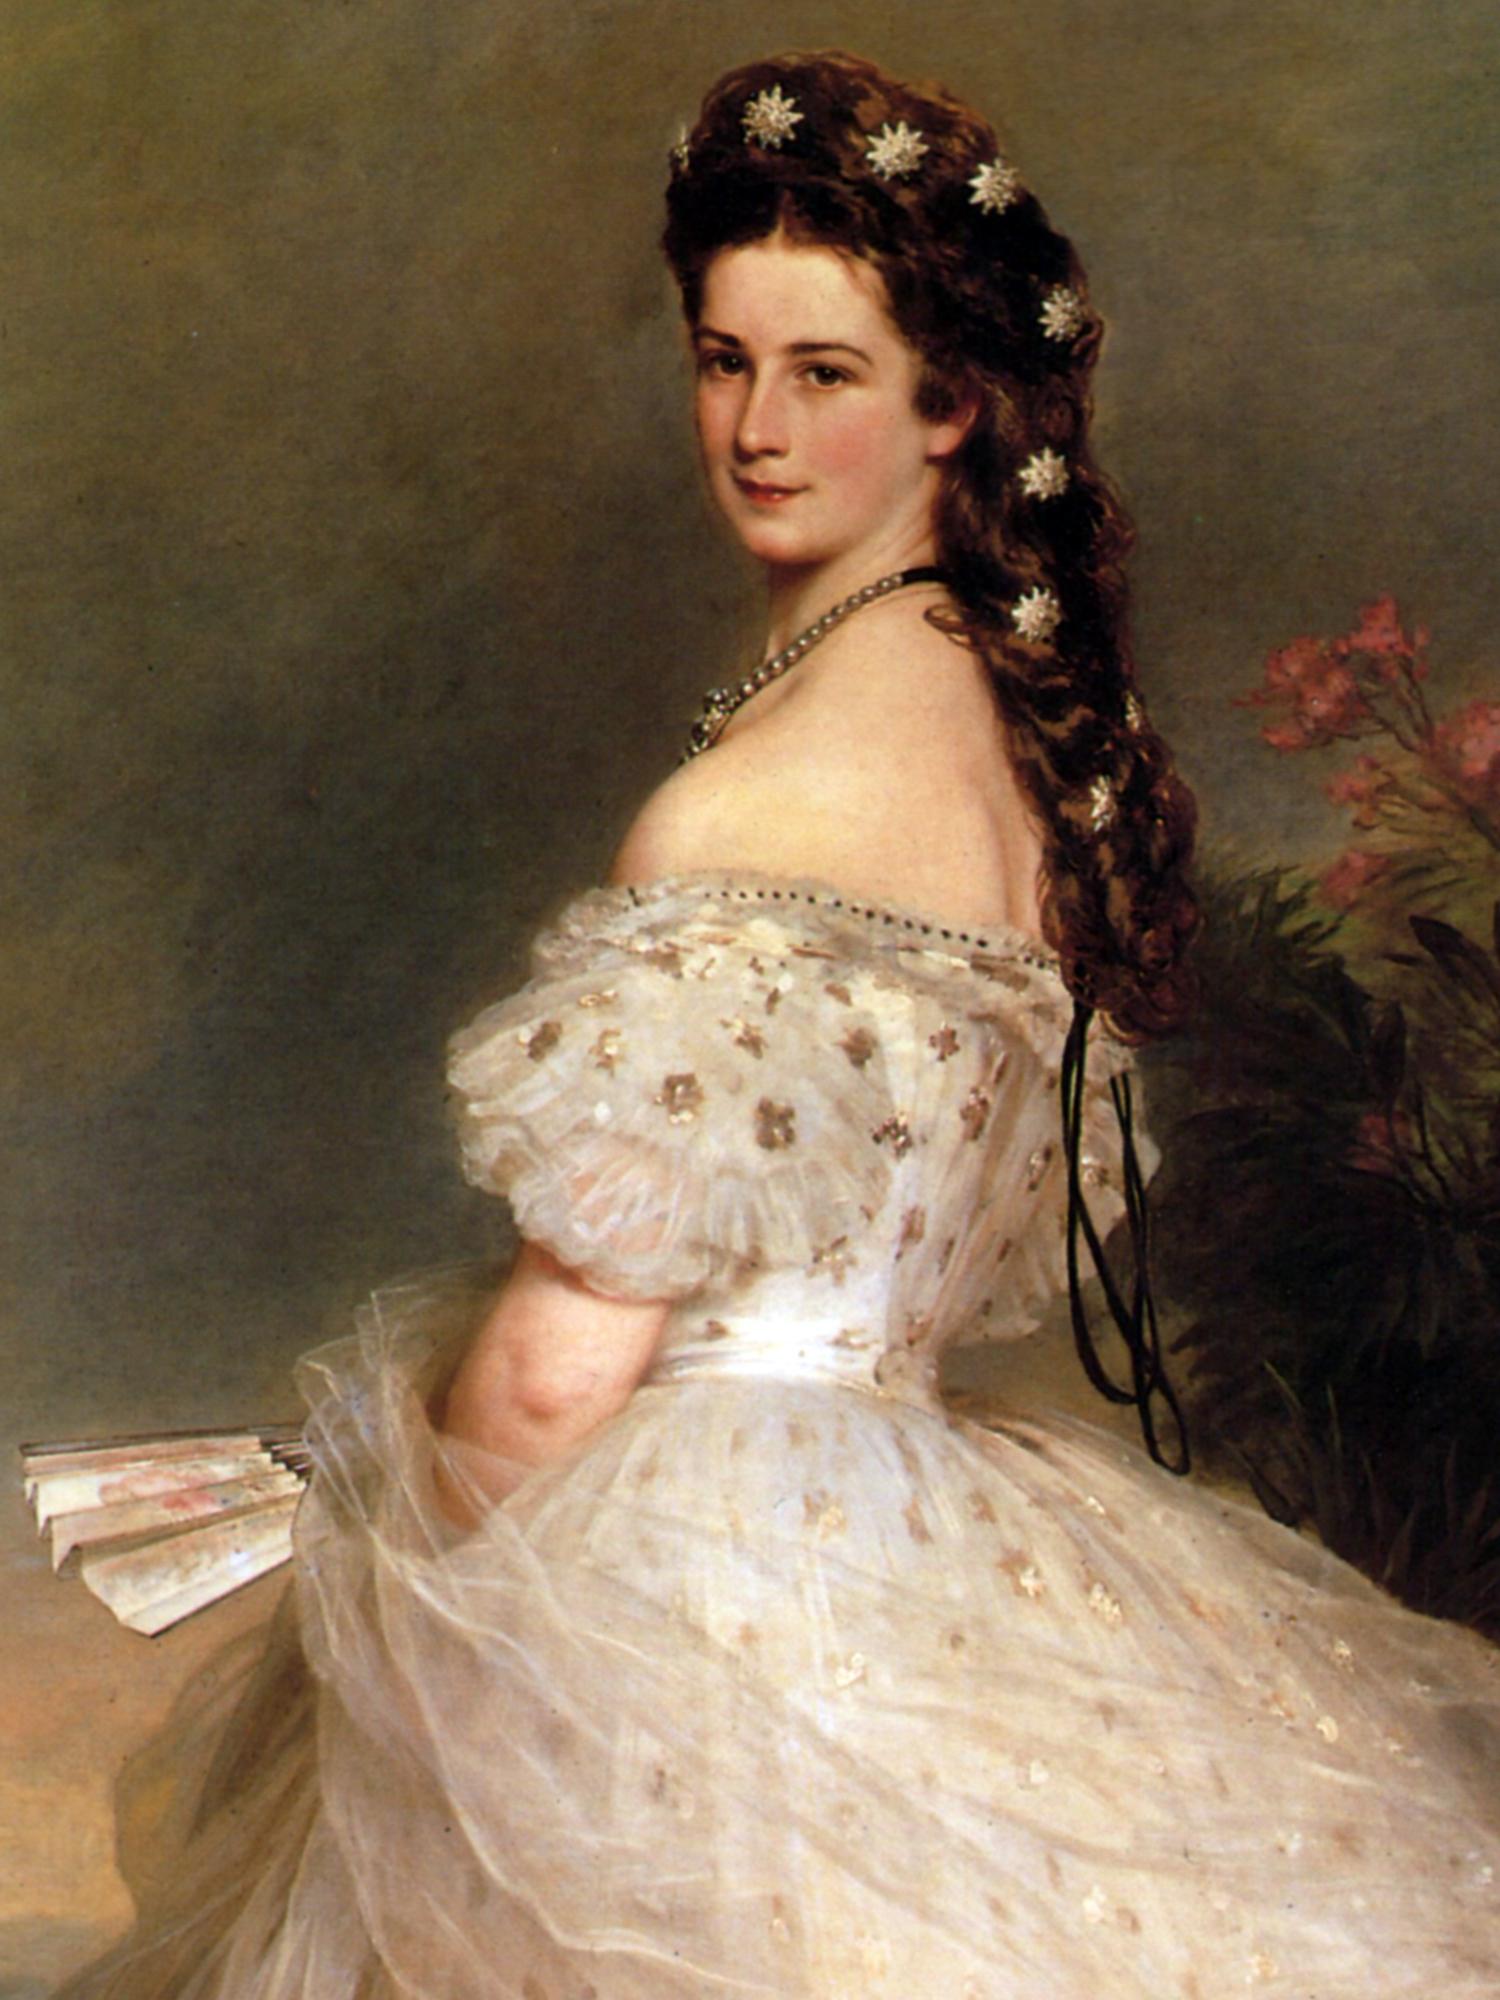 http://uploads4.wikipaintings.org/images/franz-xaver-winterhalter/empress-elisabeth-of-austria-in-dancing-dress.jpg